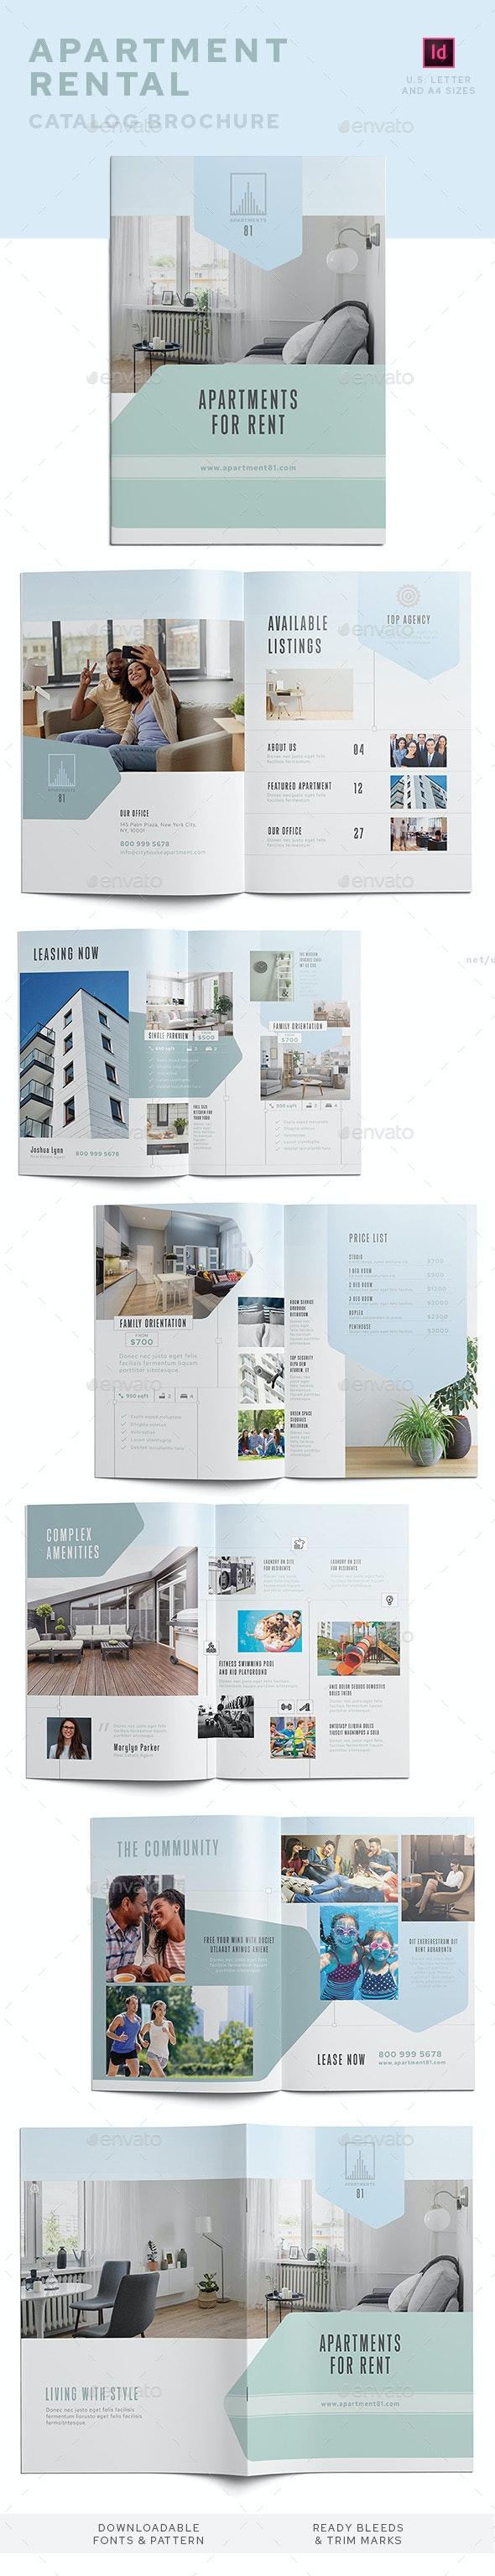 Apartment Rental Catalog - Catalogs Brochures